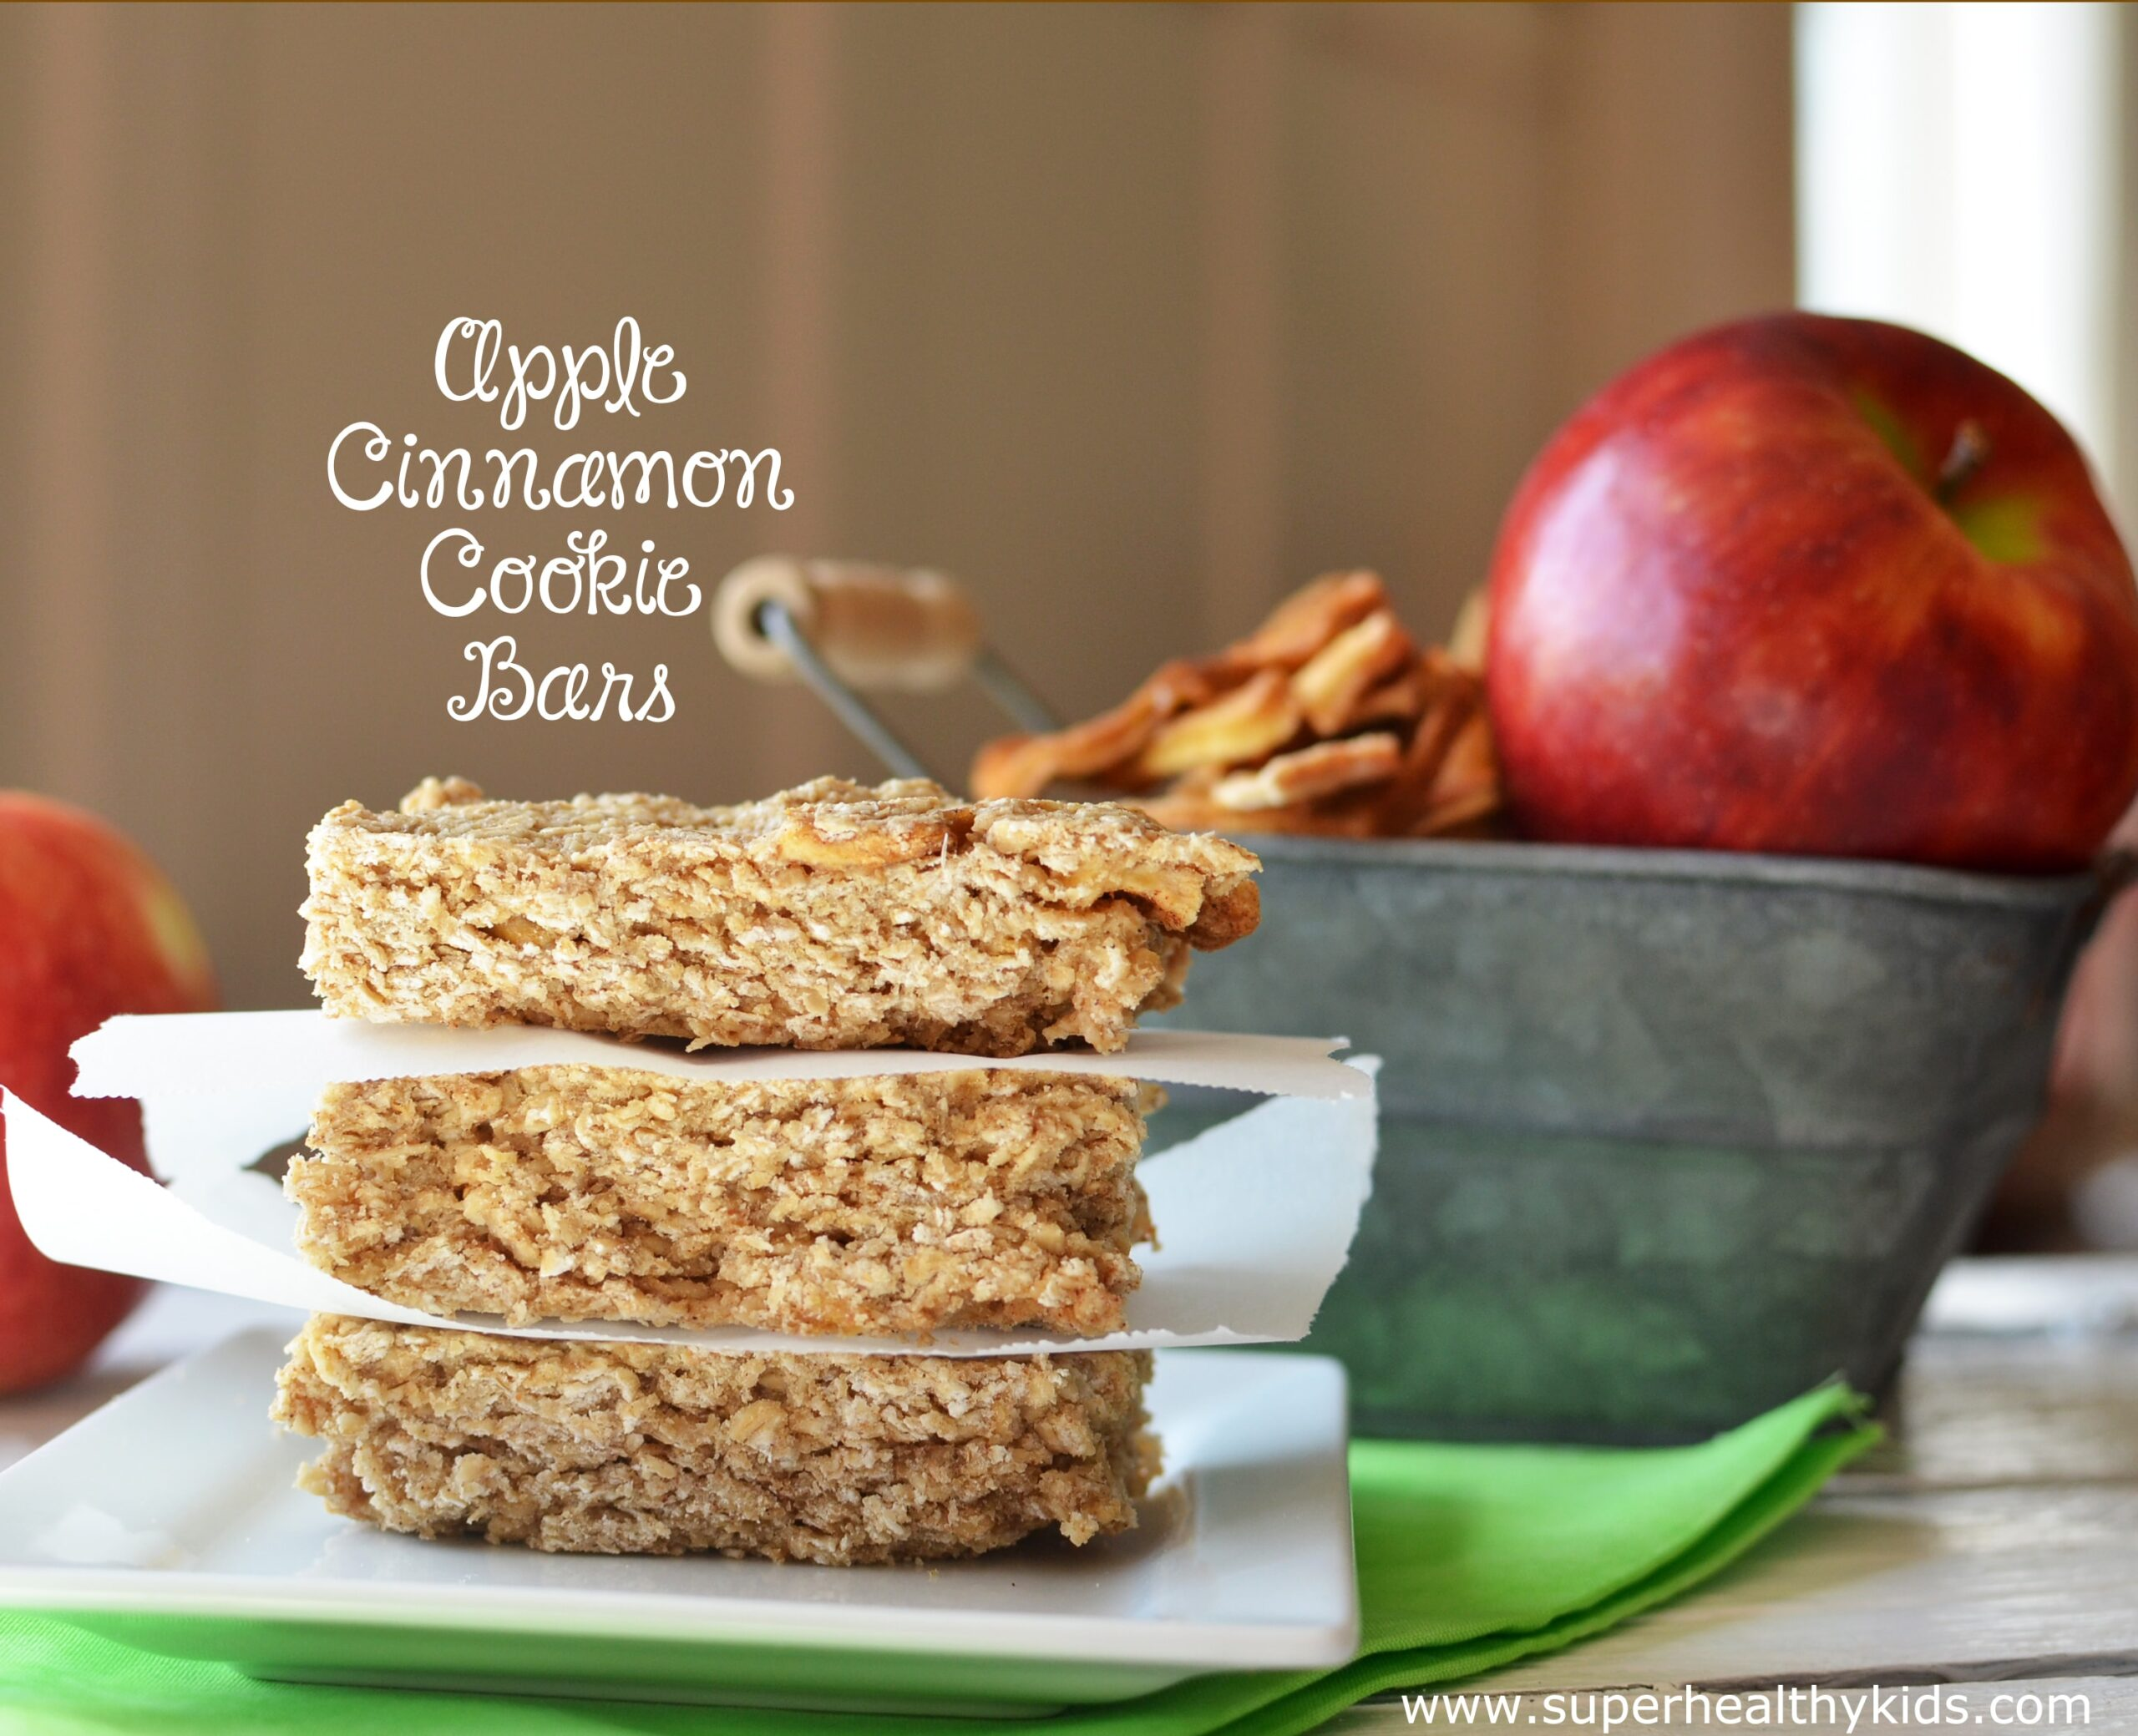 apple-cinnamon-cookie-bars-from-super-healthy-kids-b3